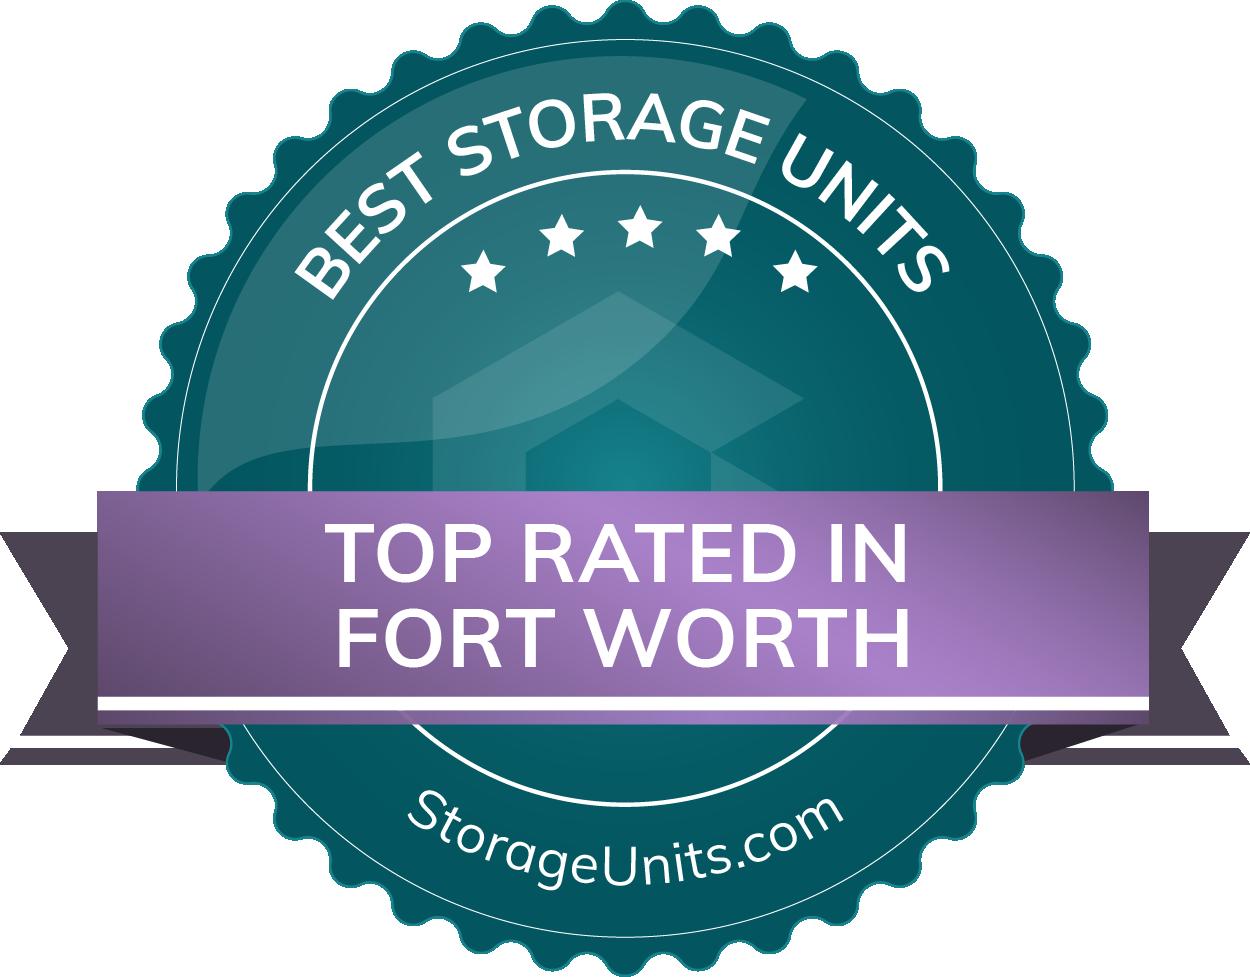 Best Self Storage Units in Fort Worth, TX